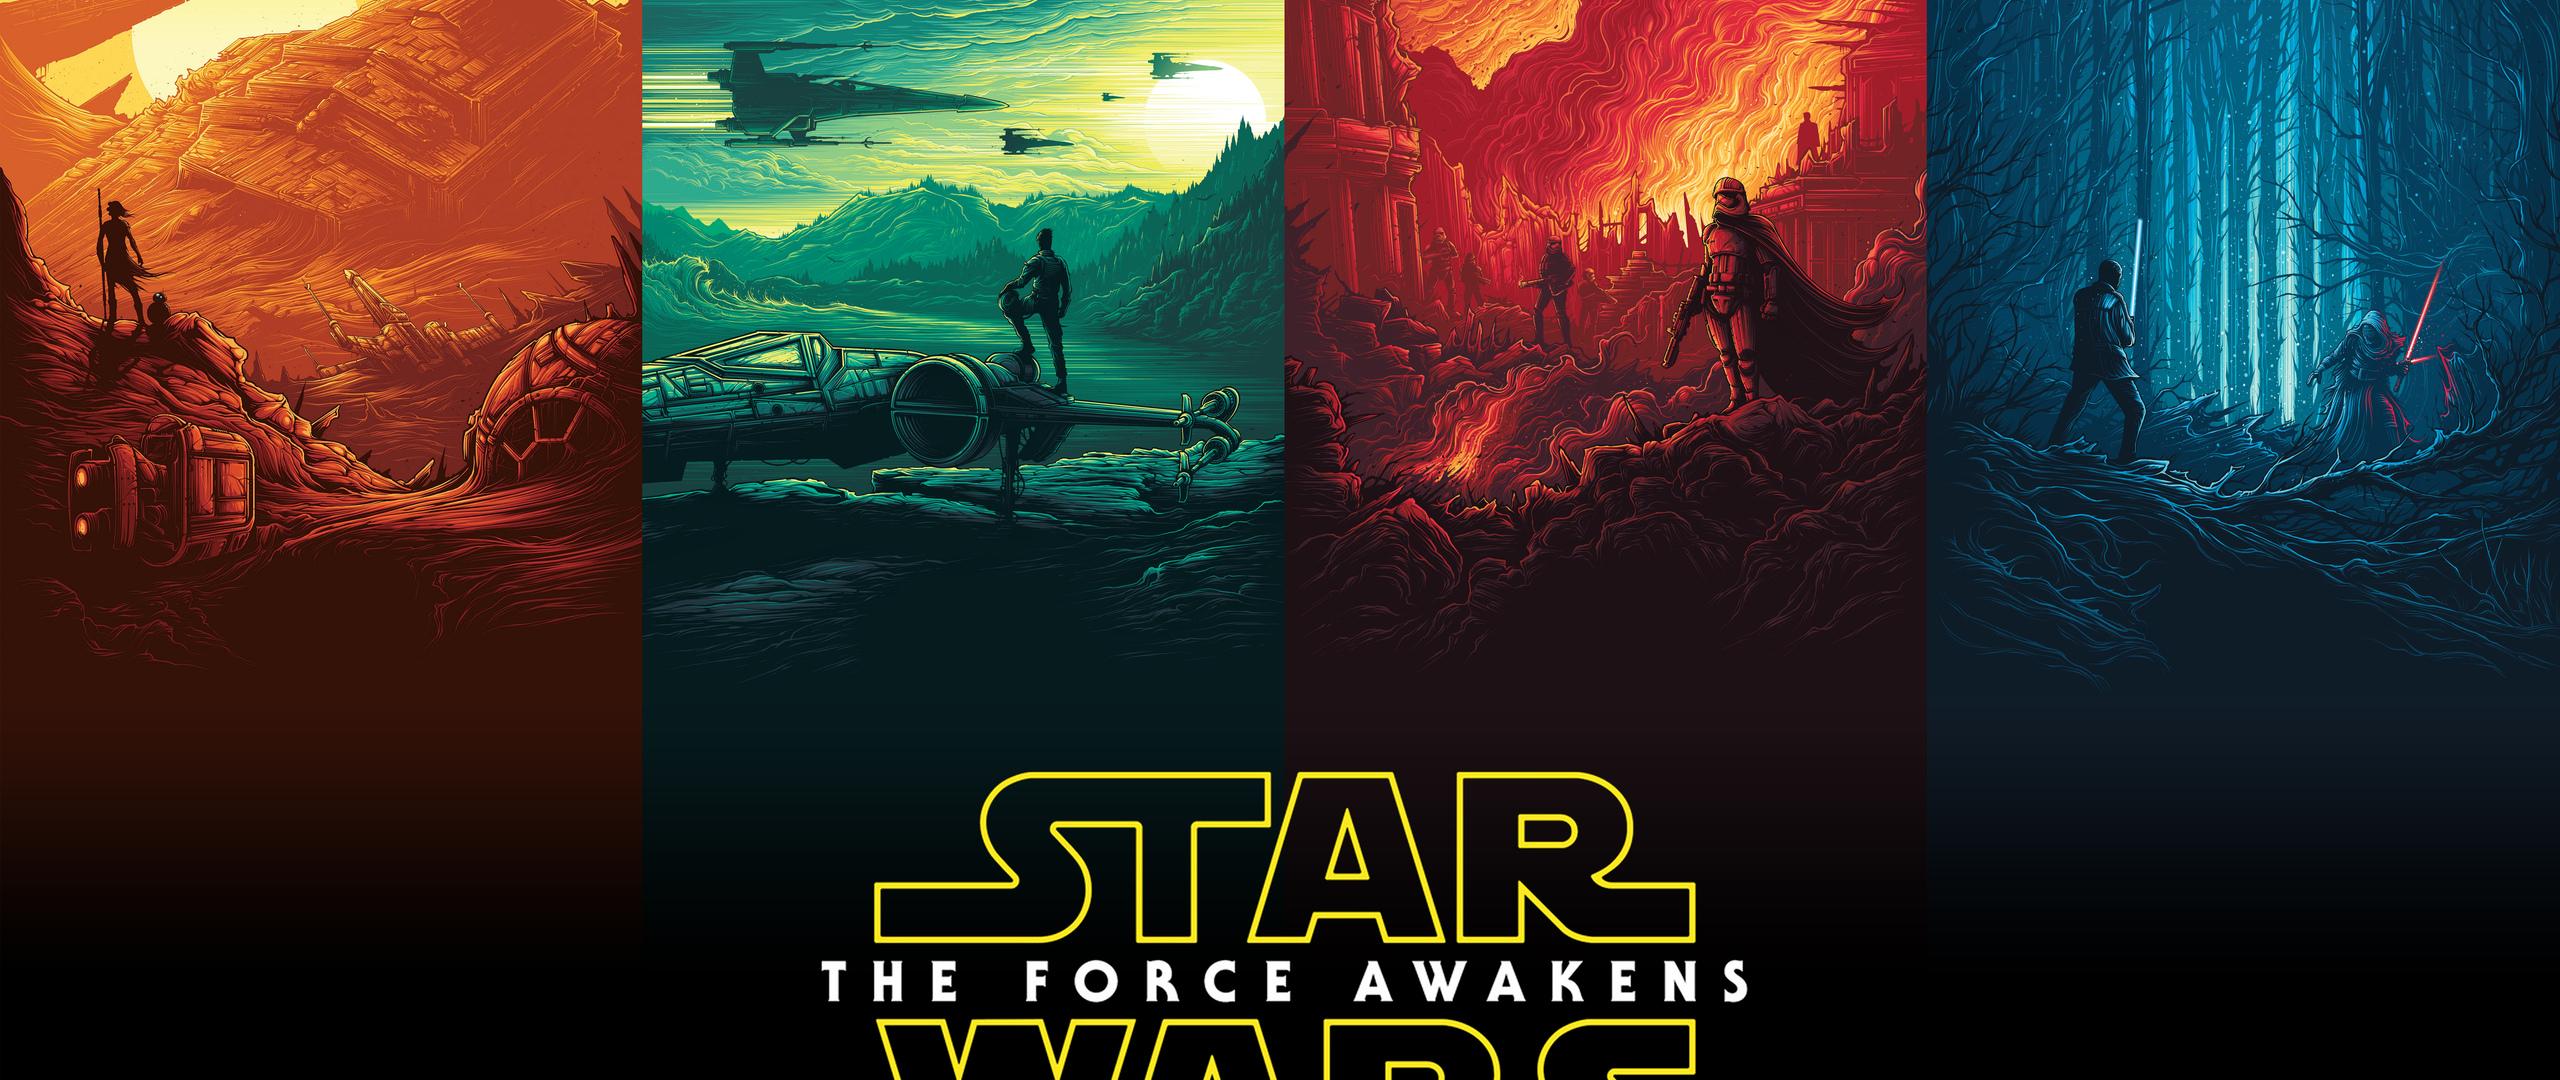 star-wars-poster-logo.jpg